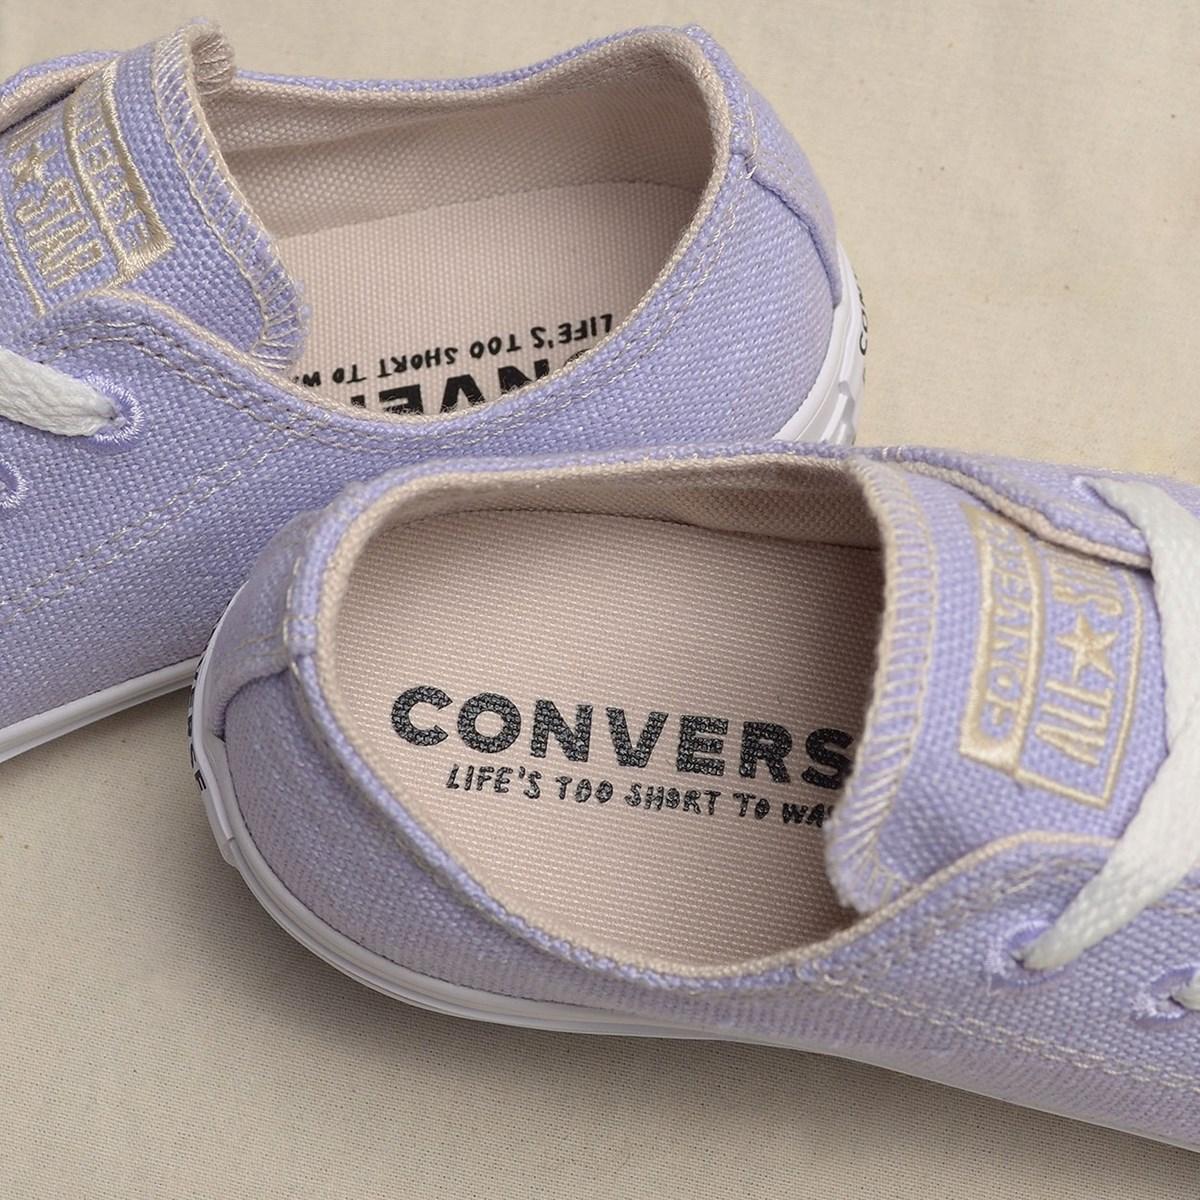 Tênis Converse Chuck Taylor All Star Renew Cotton Ox Moonstone Violet 166744C